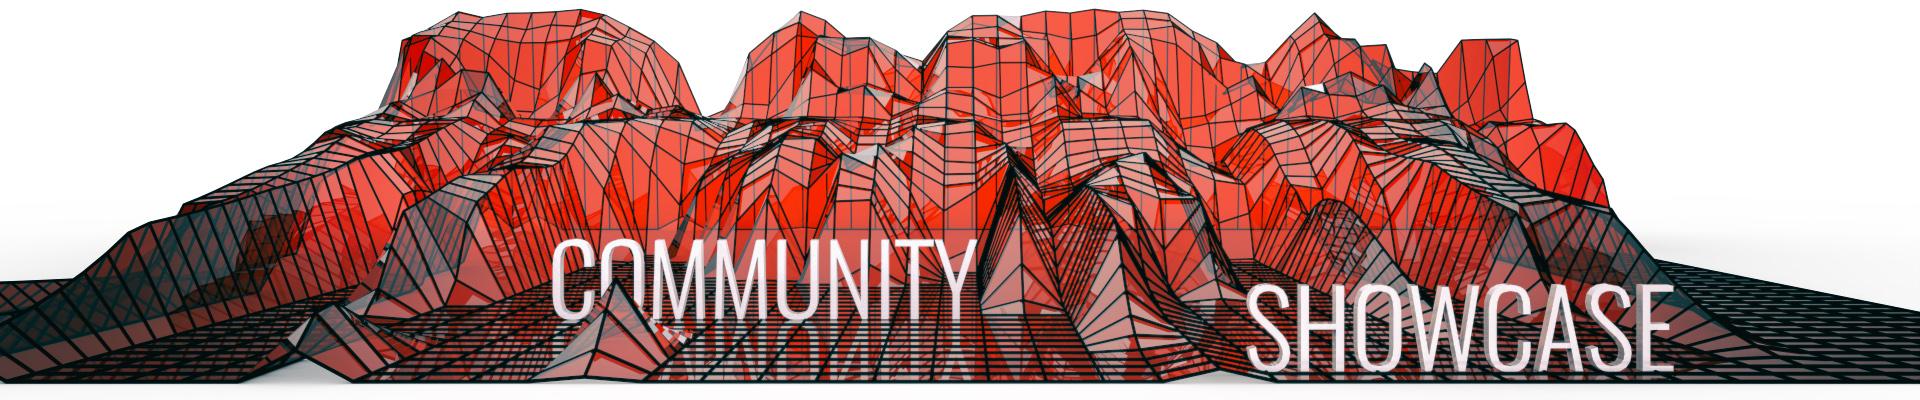 Community showcase spotlight - 3Dflow